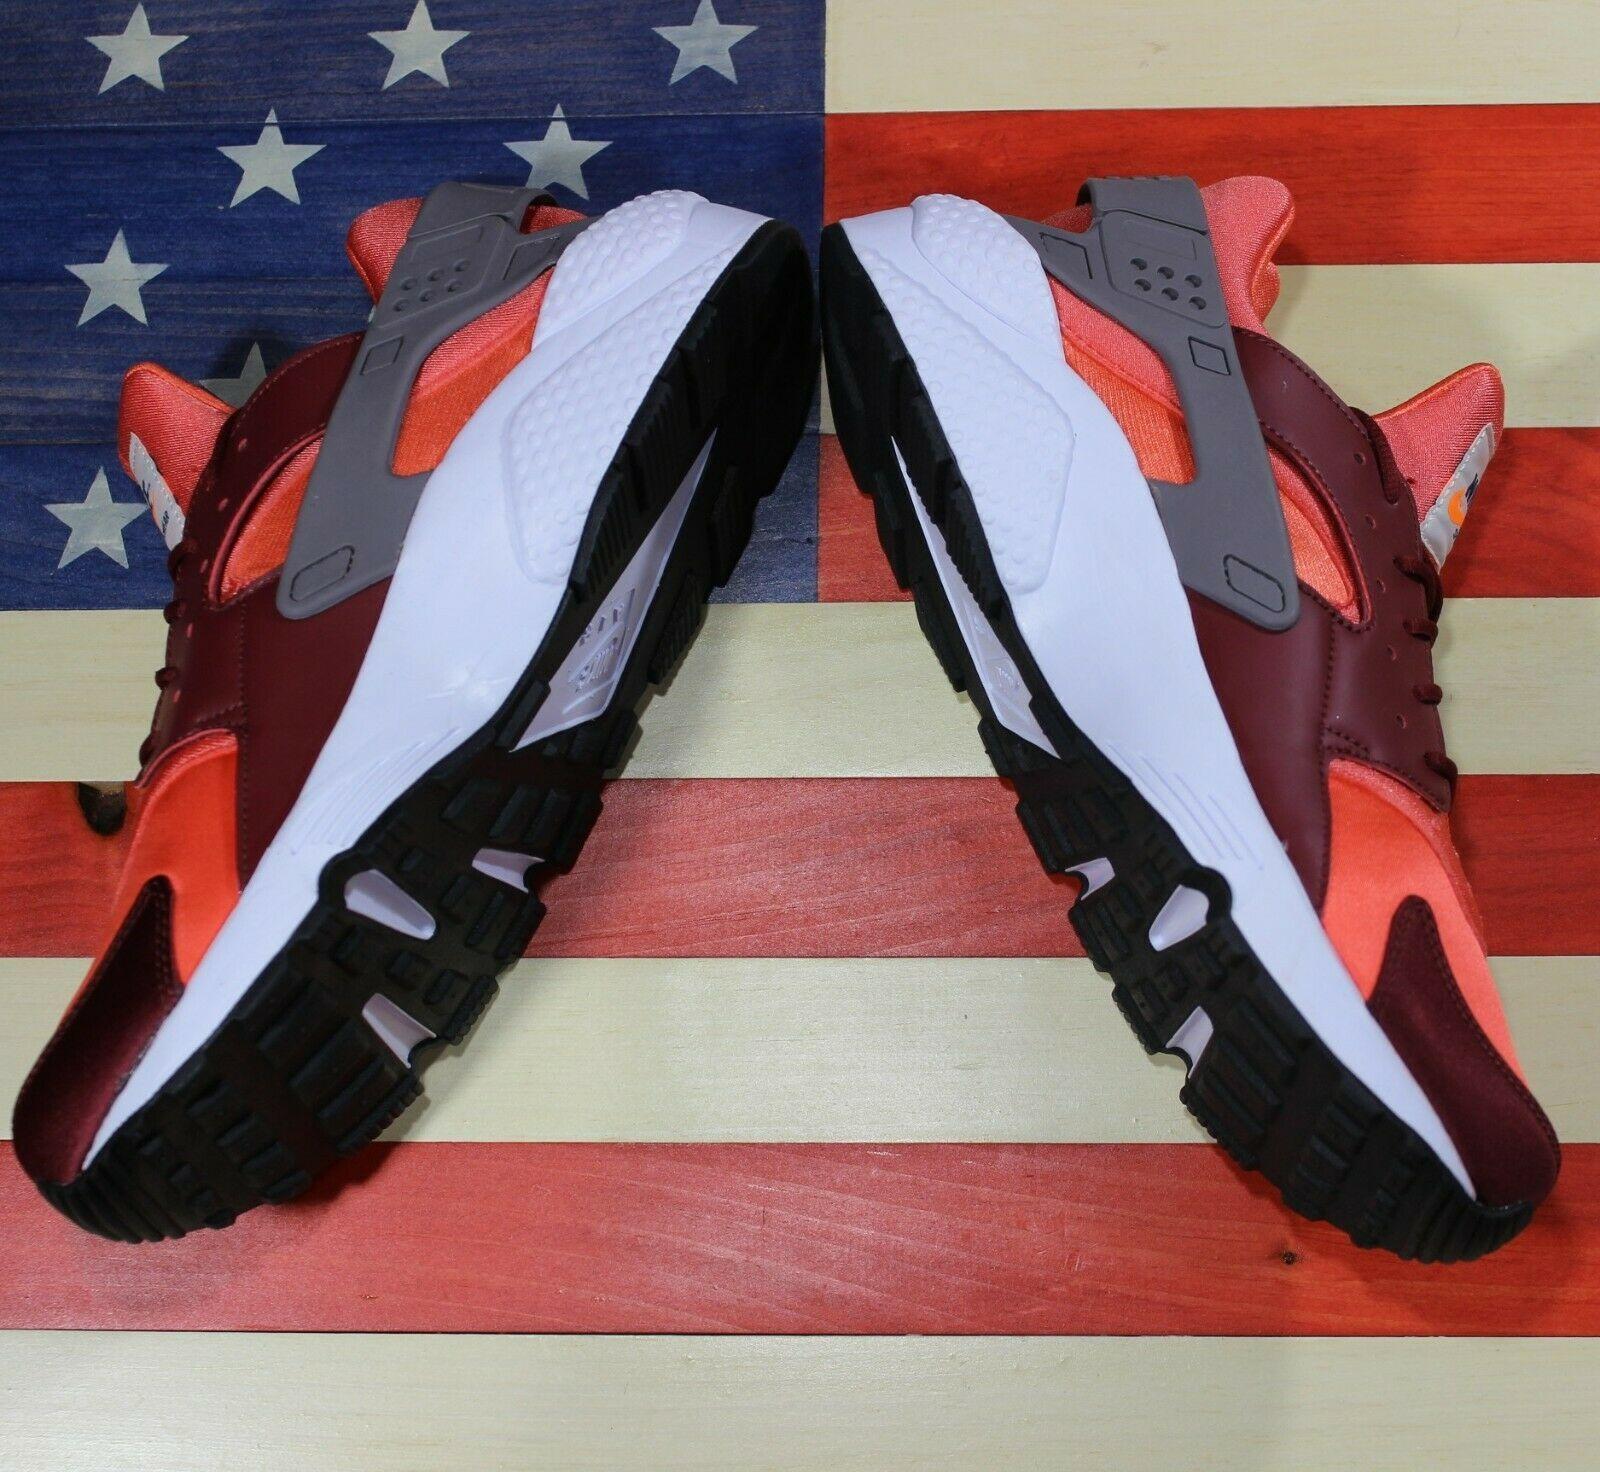 Nike Air Huarache Run Running Shoes Team Red Coral White [318429-054] Men's 11.5 image 8